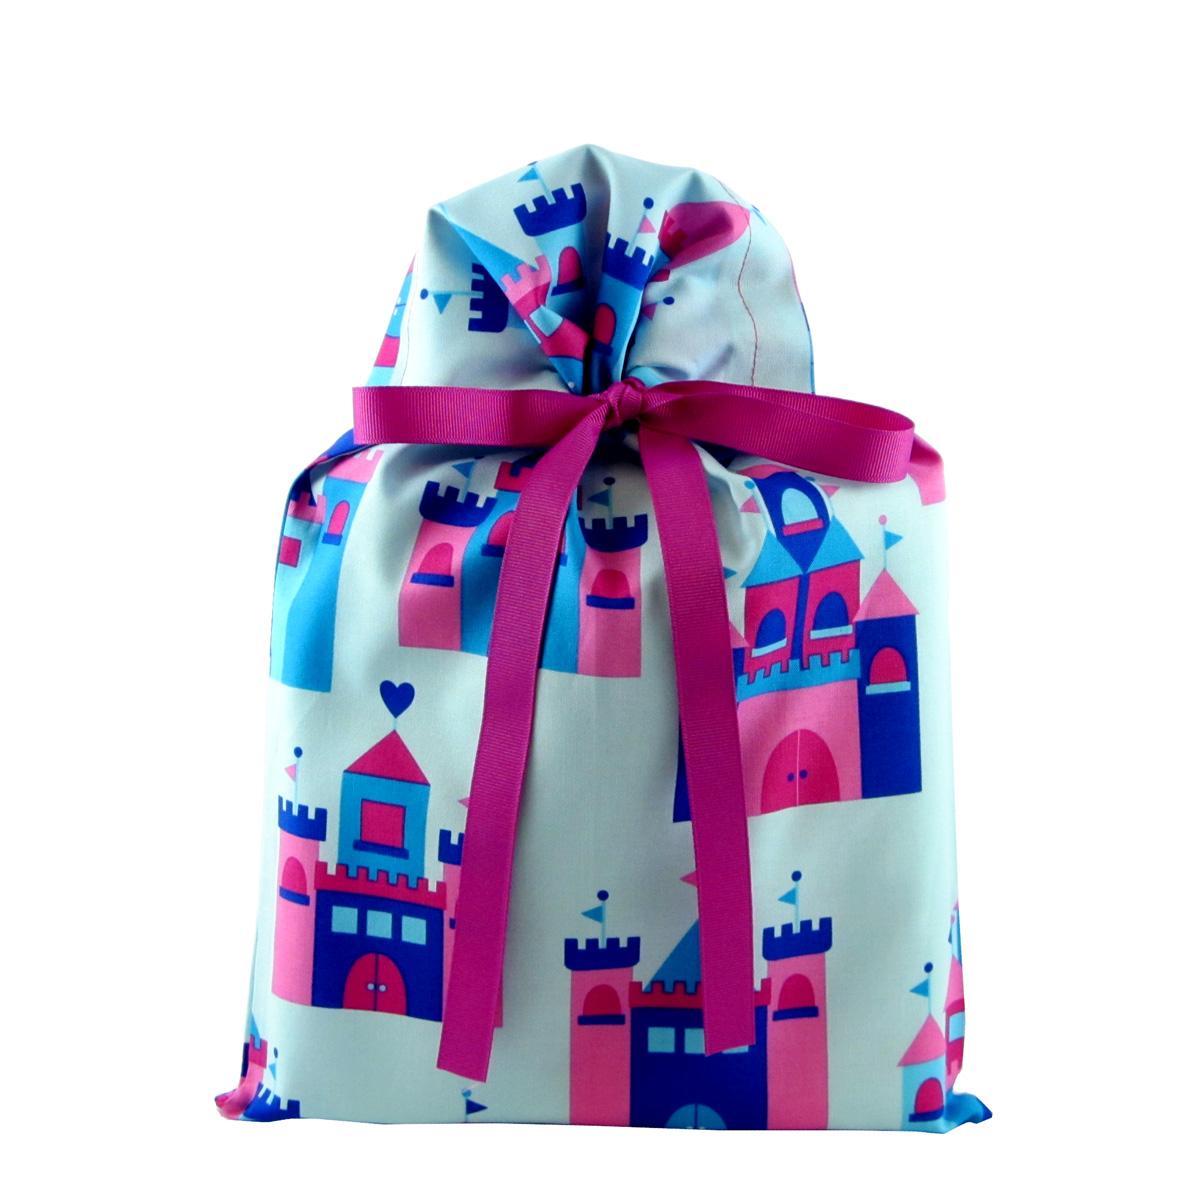 Castles-Standard-fabric-gift-bag